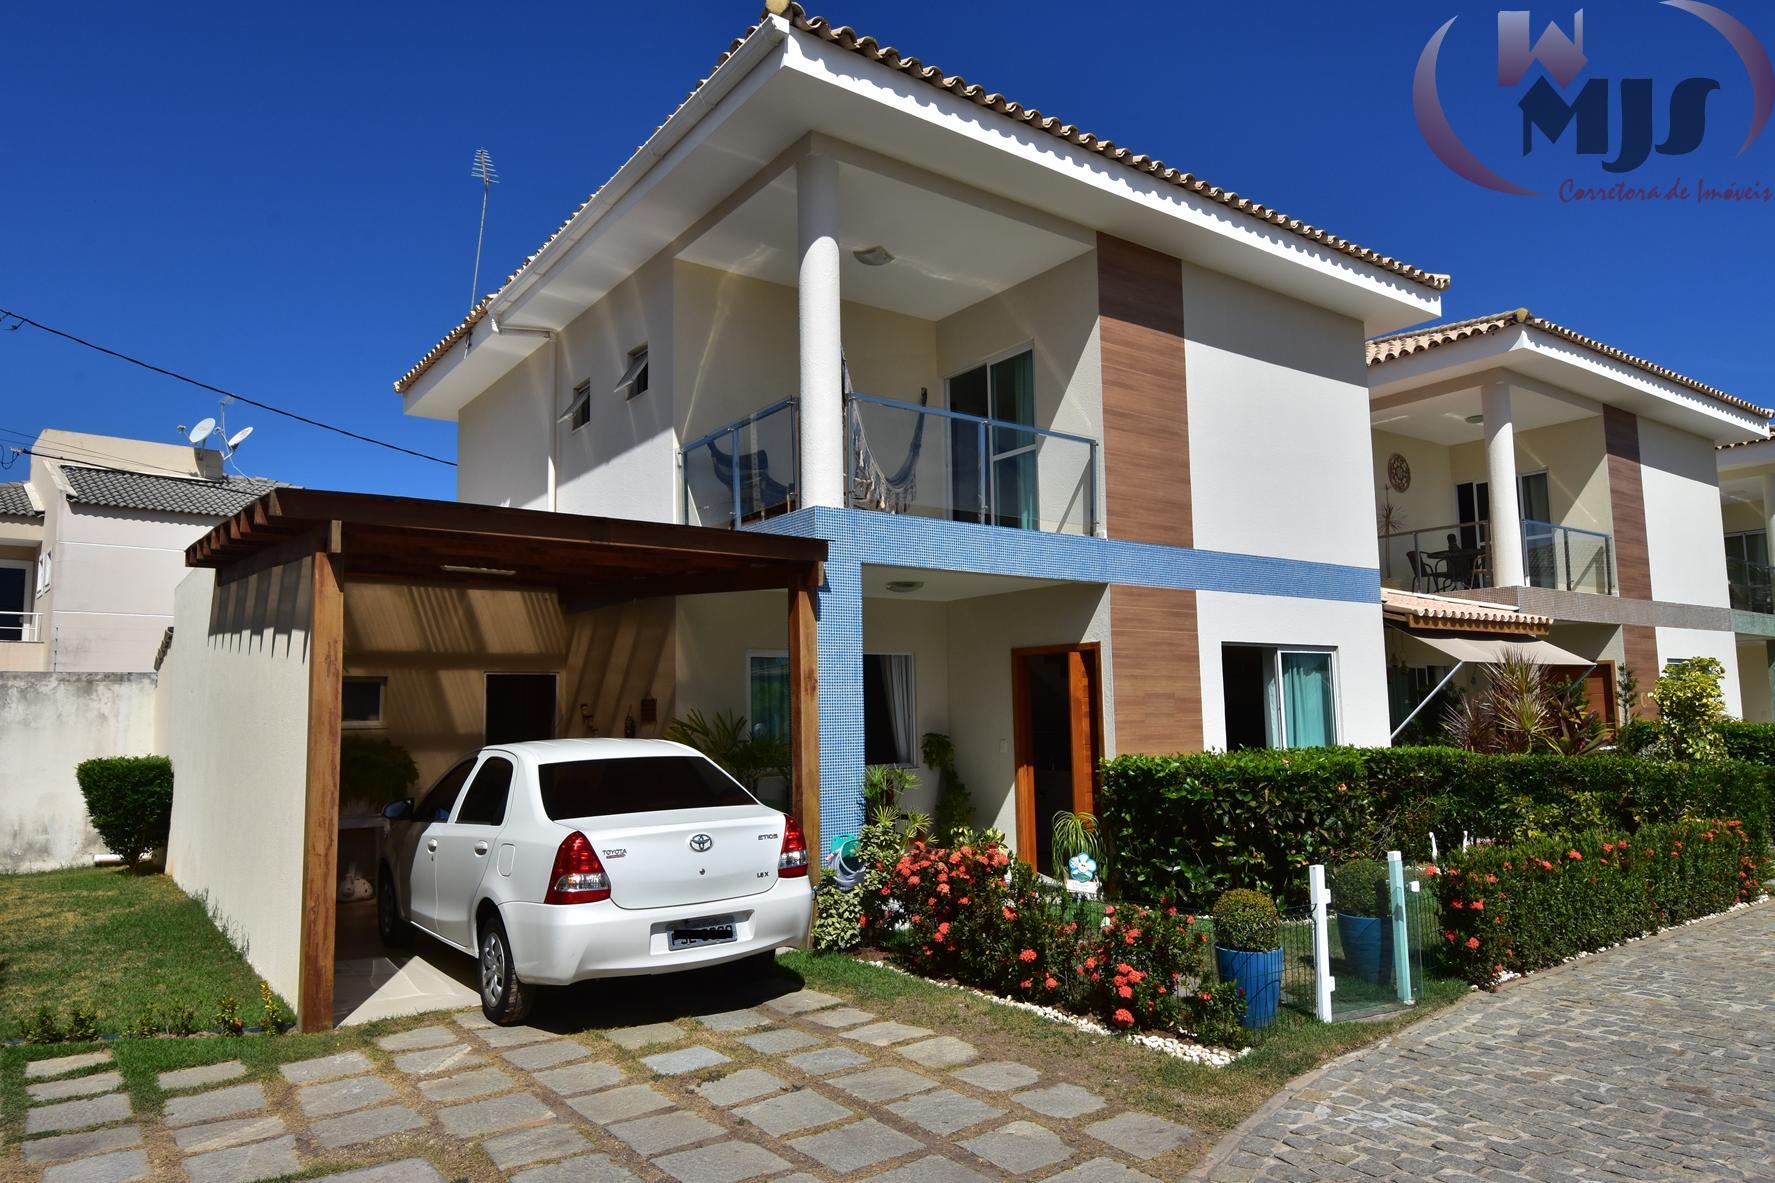 Casa a venda Port Ghalib Buraquinho MJS Imóveis MJS Imóveis #204797 1775x1183